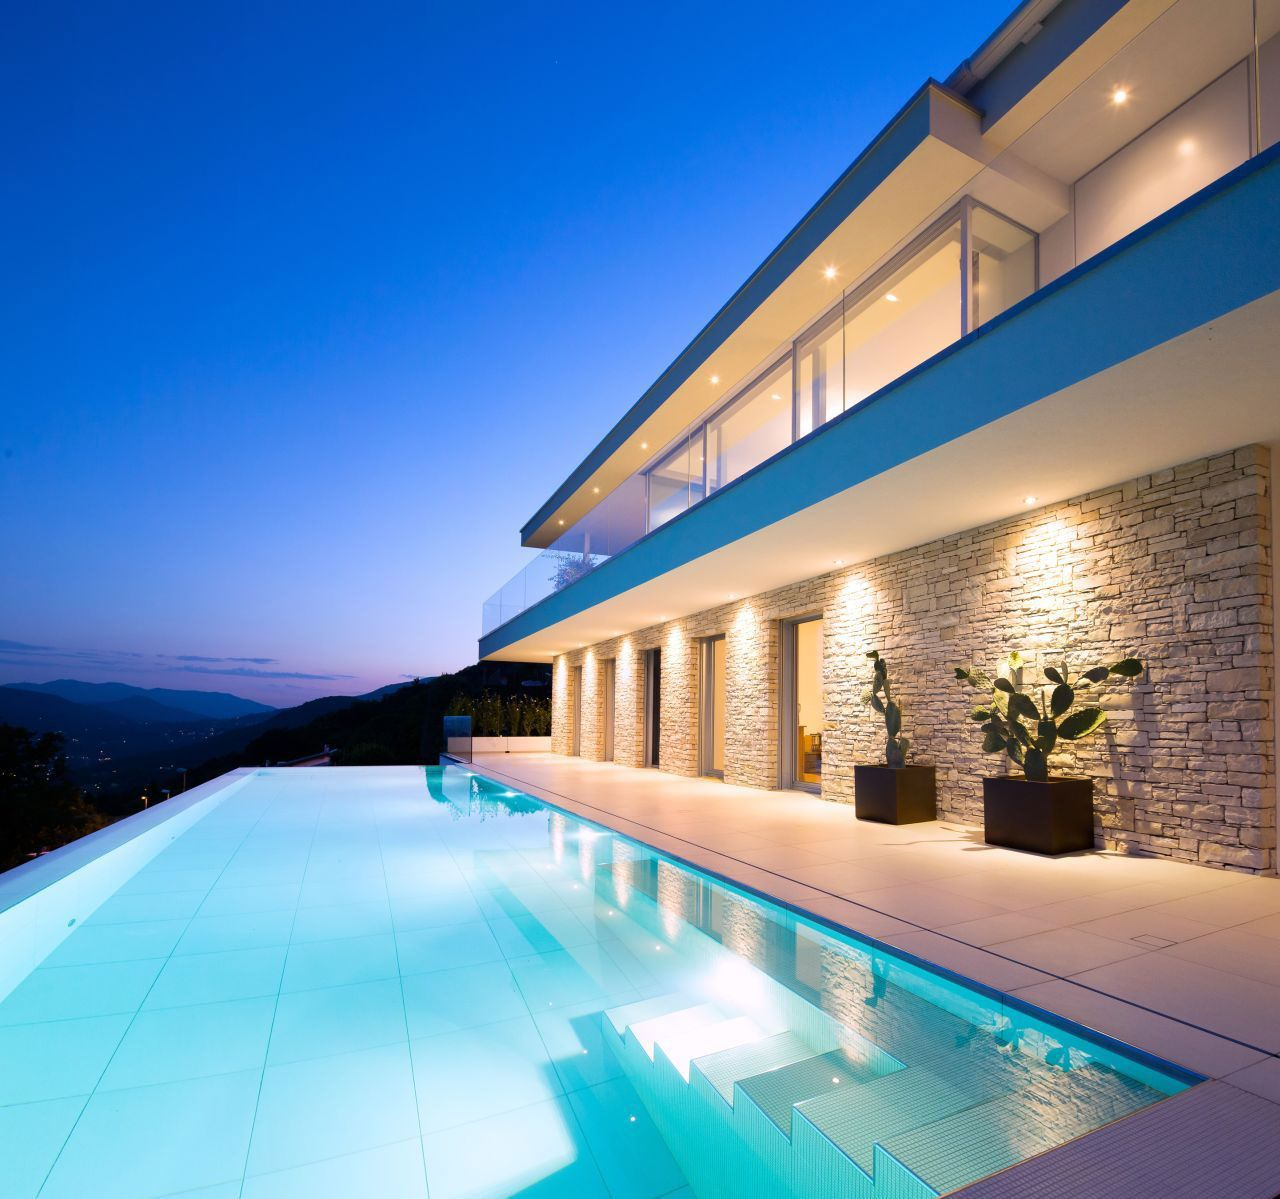 House Lombardo By Philipp Architekten 24 Homedsgn Switzerland House Outdoor Outdoor Pool